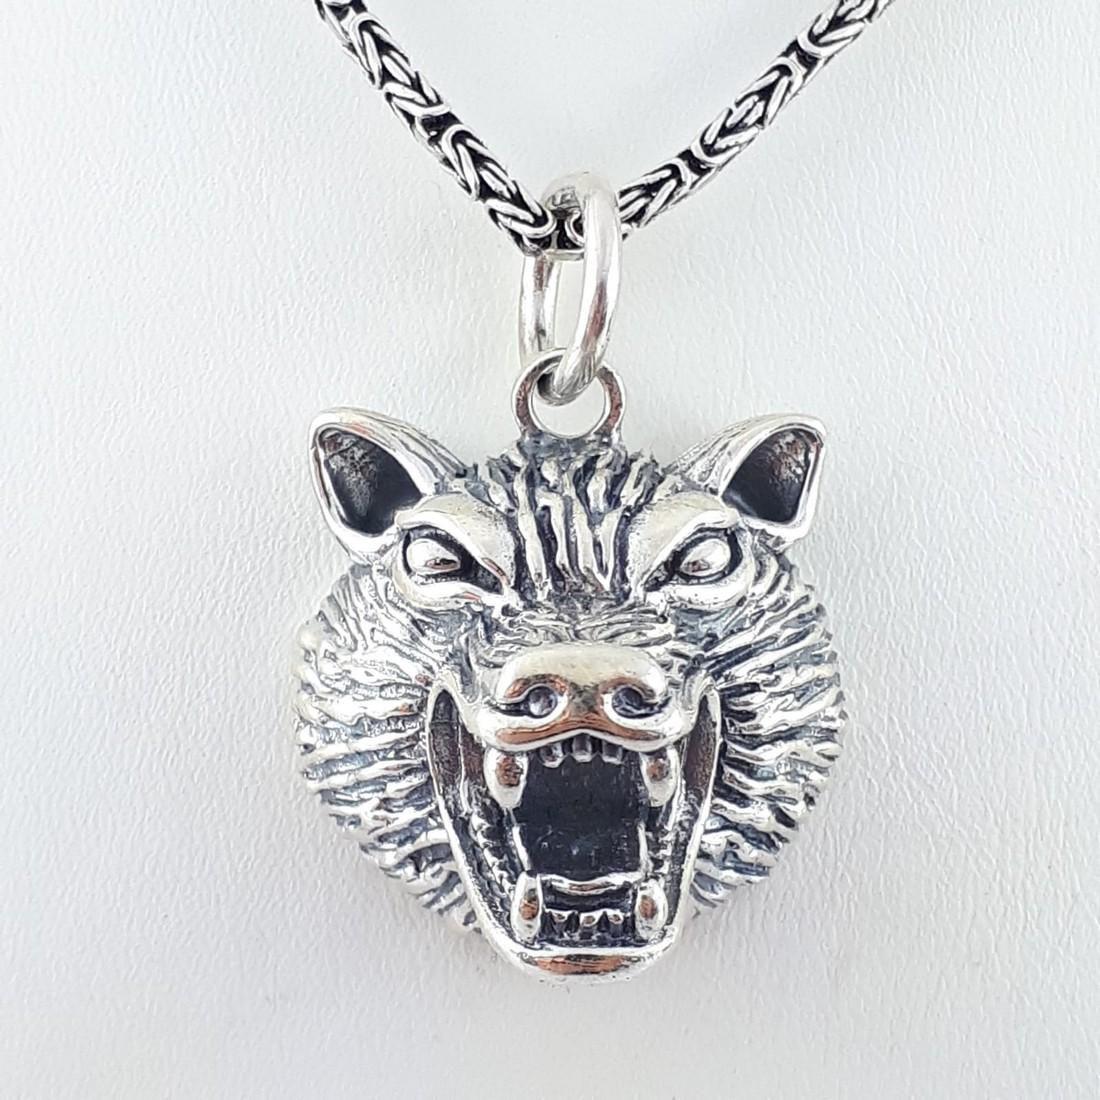 925 Sterling Silver - Necklace & Pendant Set